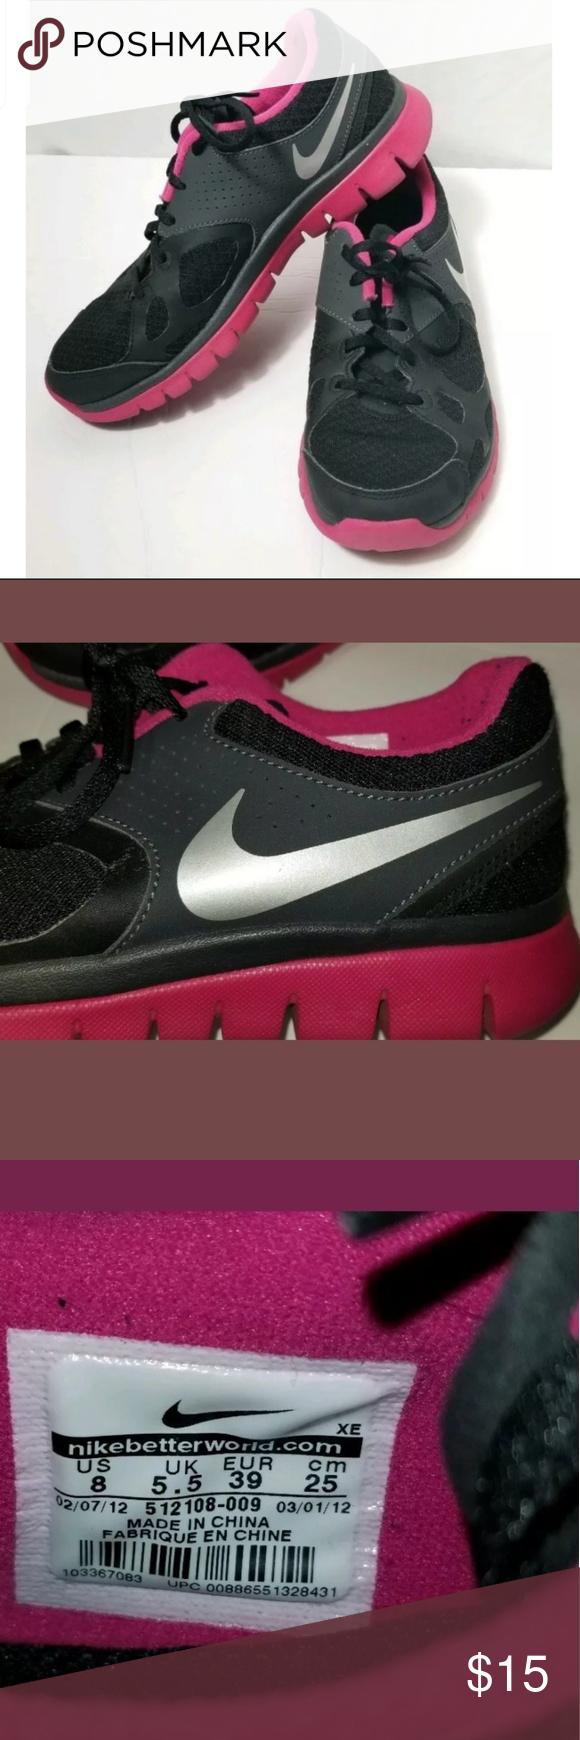 Monumento compañero cangrejo  Nike Flex Fitsole Running Shoes NIKE FLEX FITSOLE #512108-009 WOMEN'S  RUNNING SHOES BLACK PINK SZ 8. Pre-loved condition with lot… | Nike flex,  Nike, Running shoes